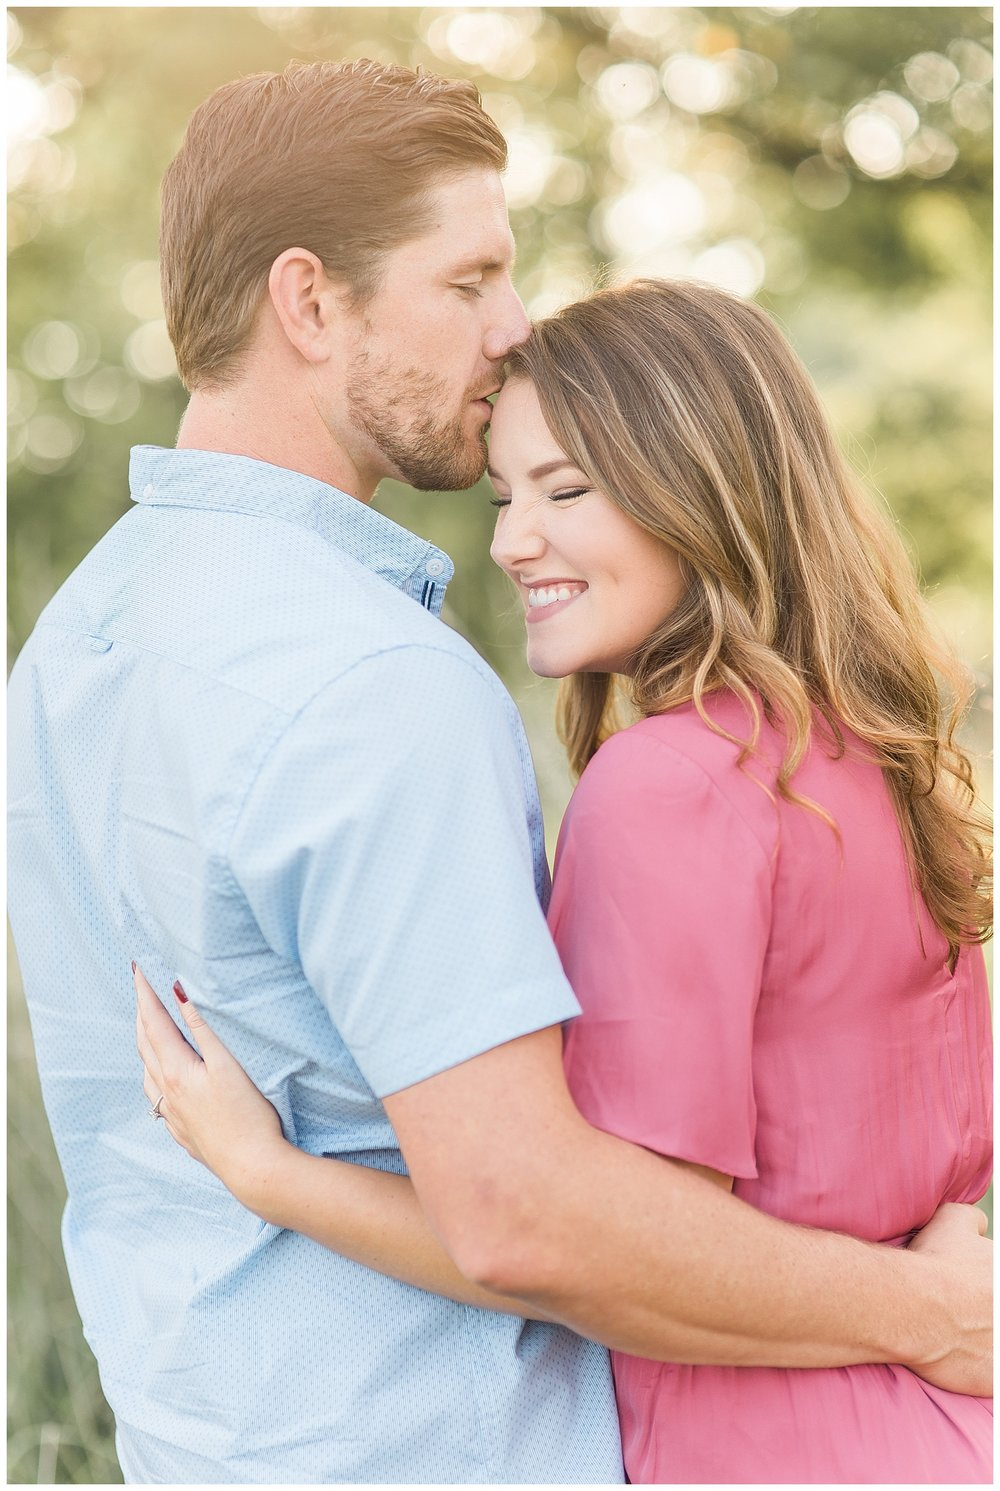 everleigh-photography-cincinnati-wedding-photographer-kentucky-wedding-photographer-25